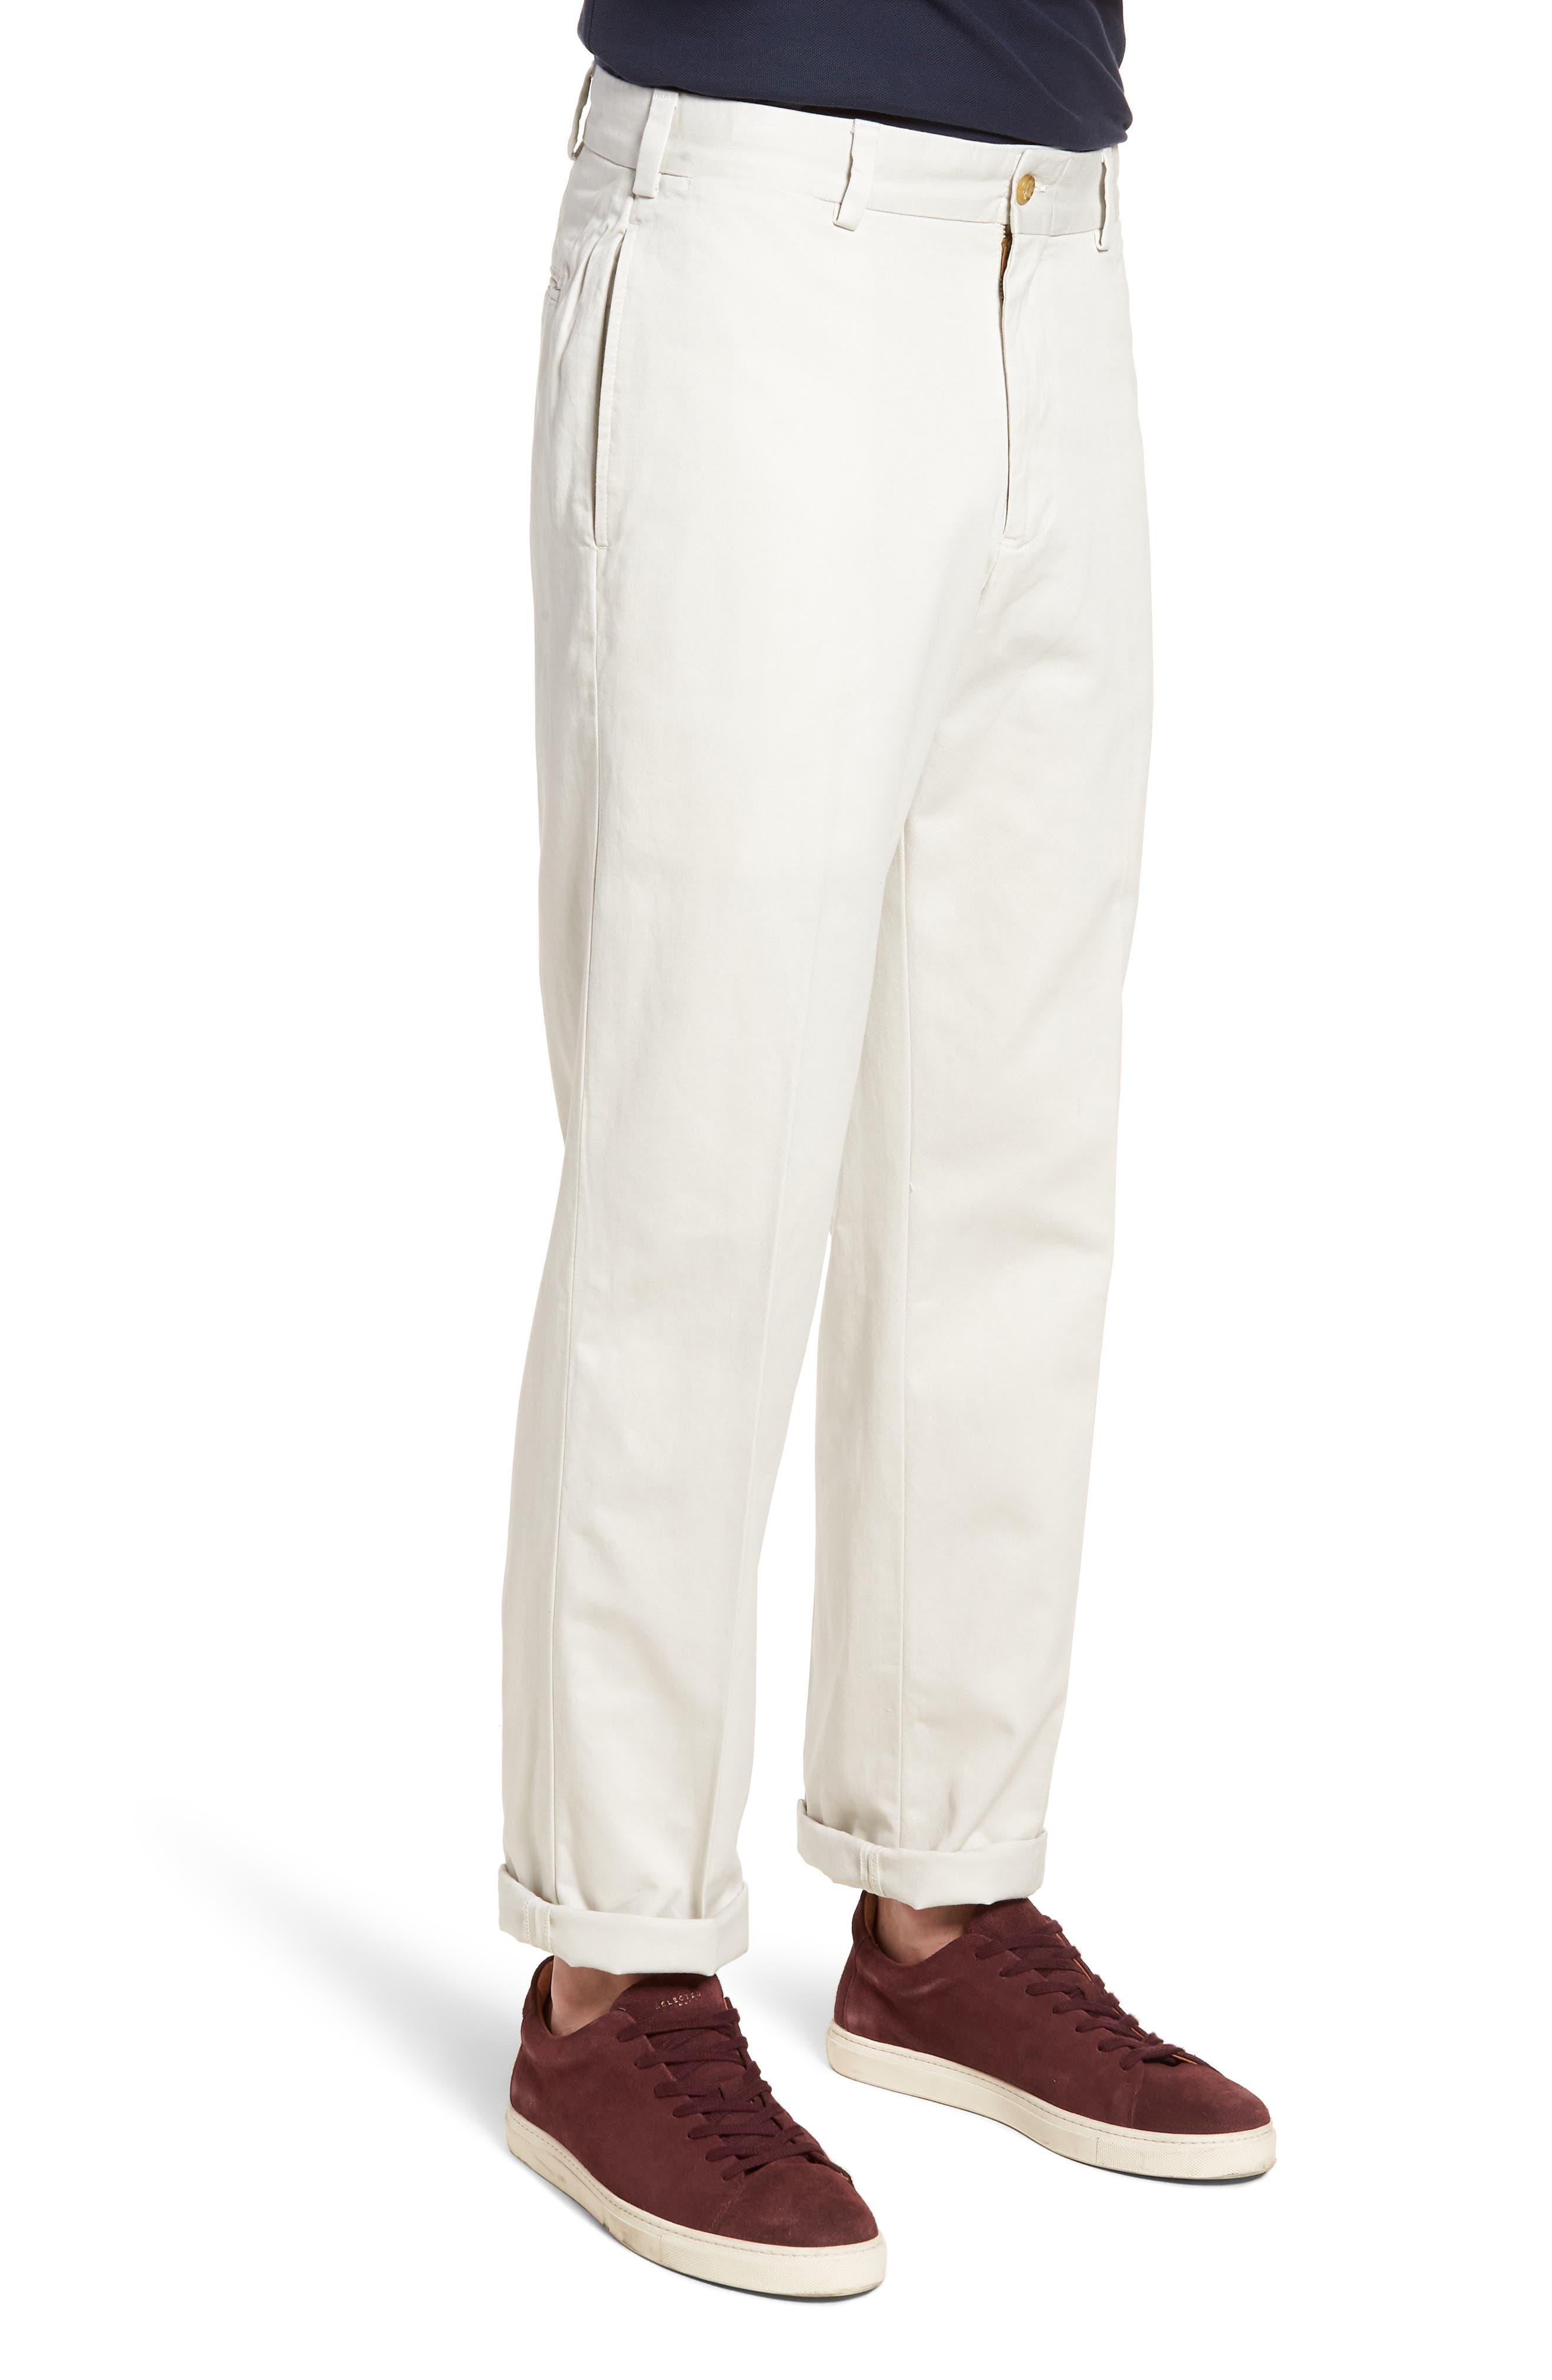 M2 Classic Fit Vintage Twill Flat Front Pants,                             Alternate thumbnail 3, color,                             270